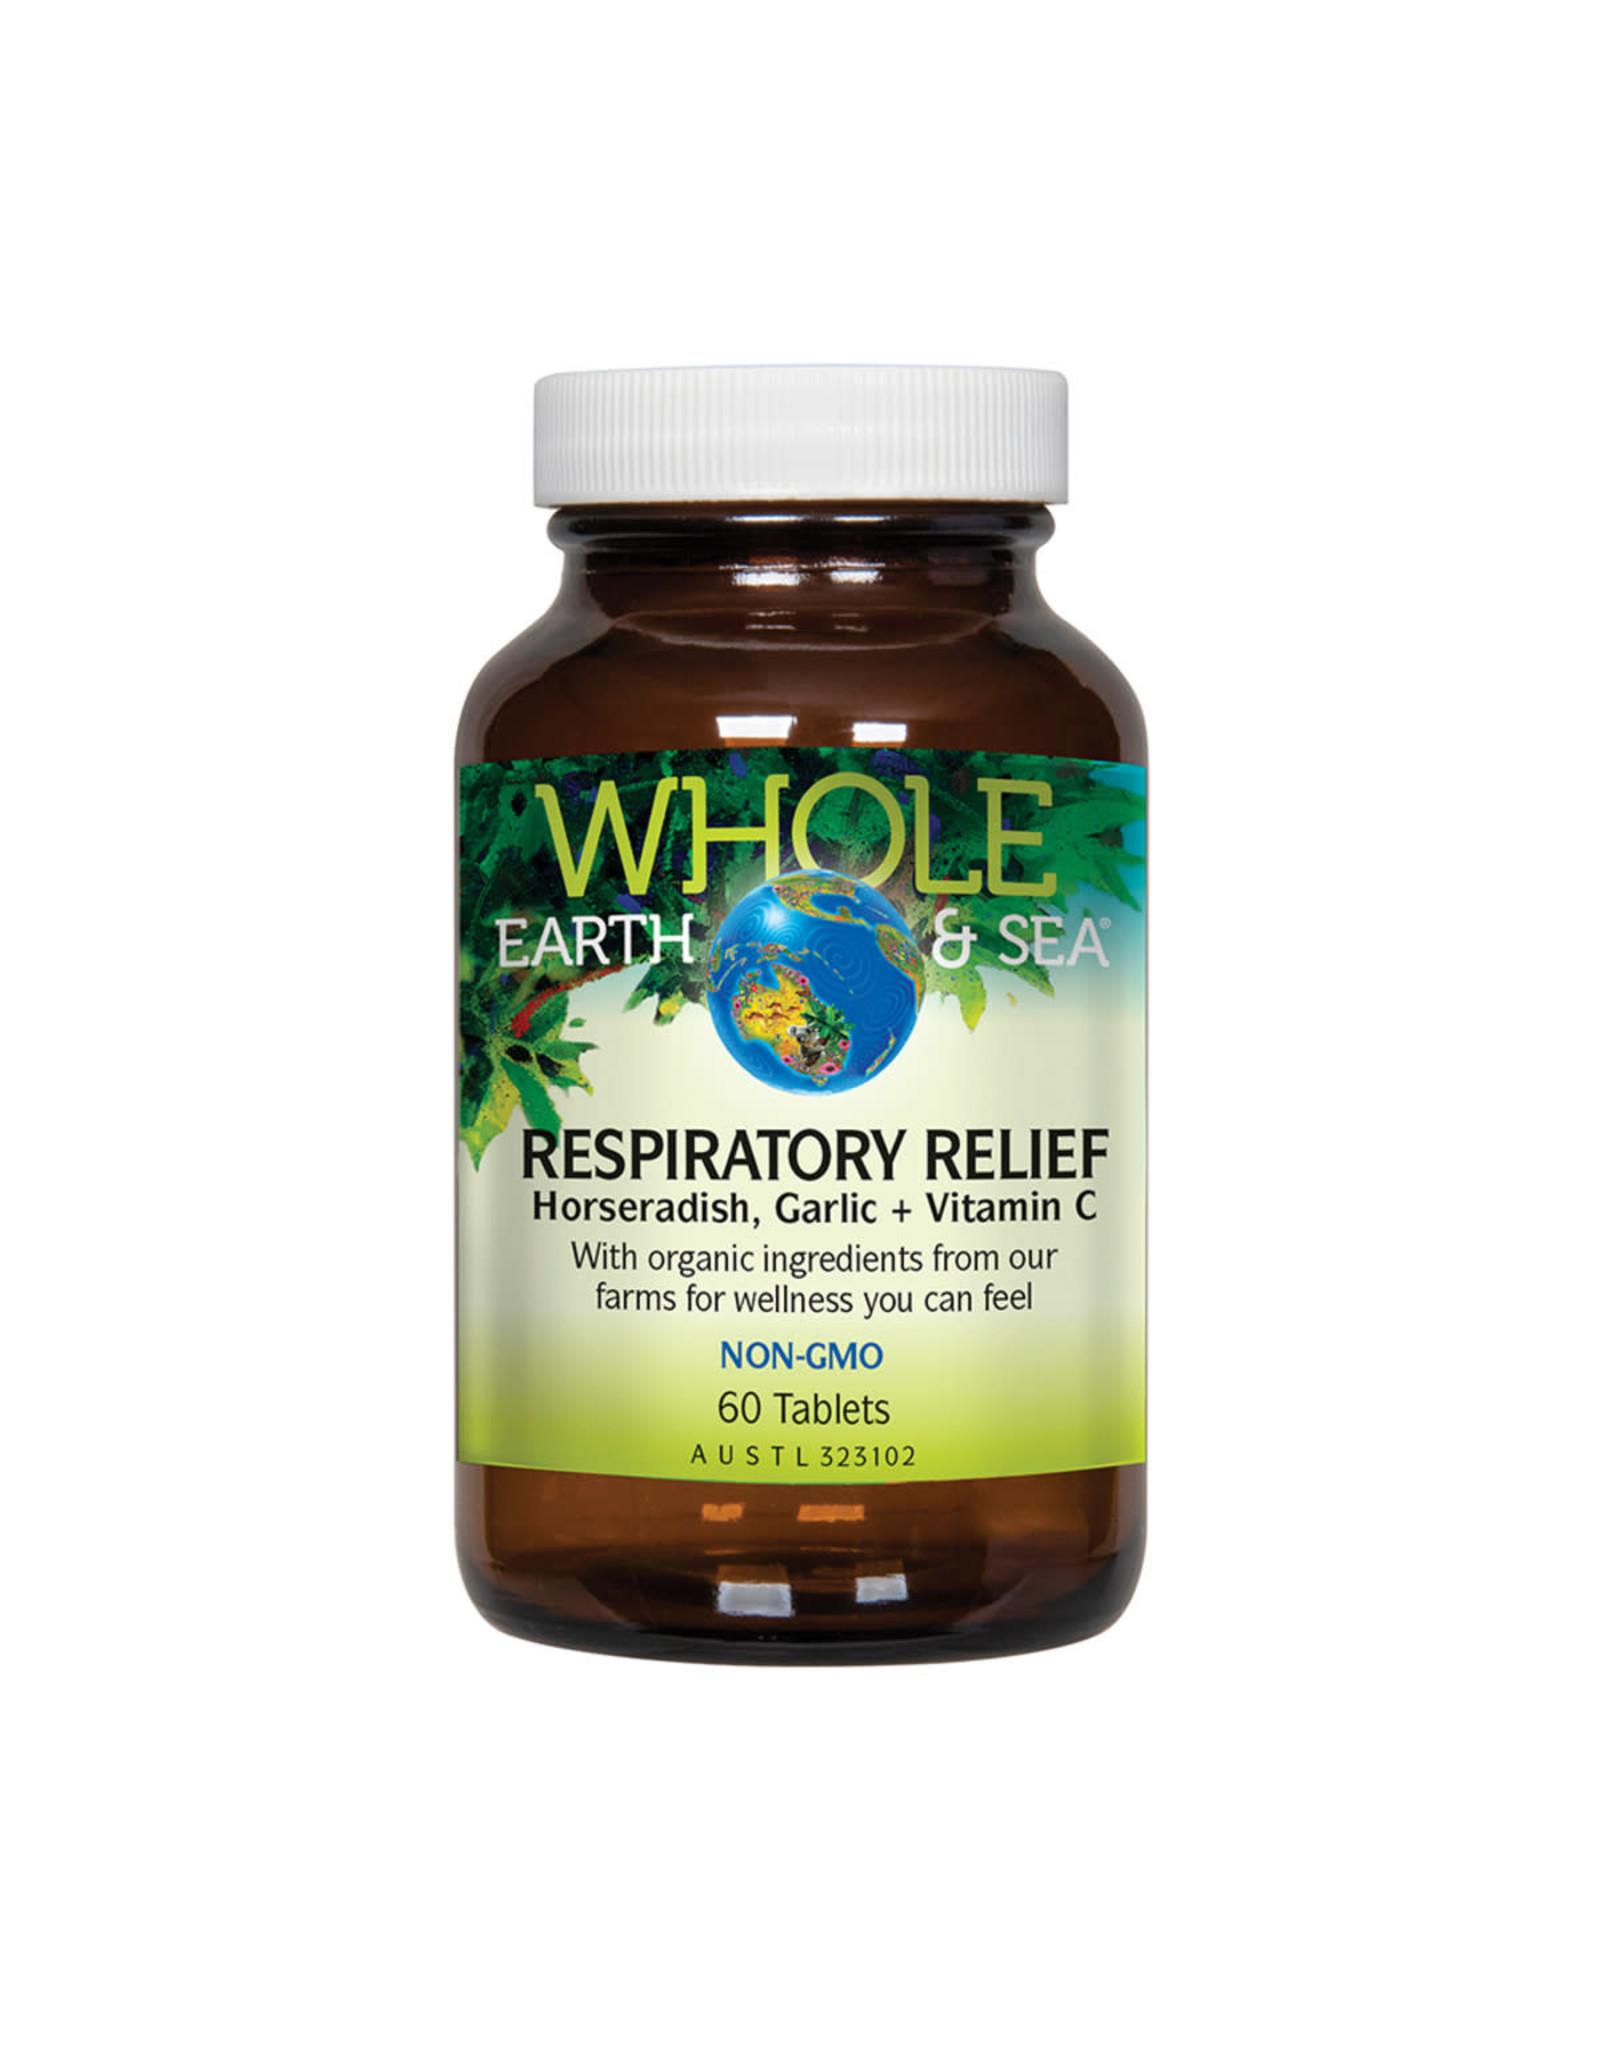 Whole Earth & Sea Respiratory Relief (Horseradish, Garlic + Vitamin C) 60t